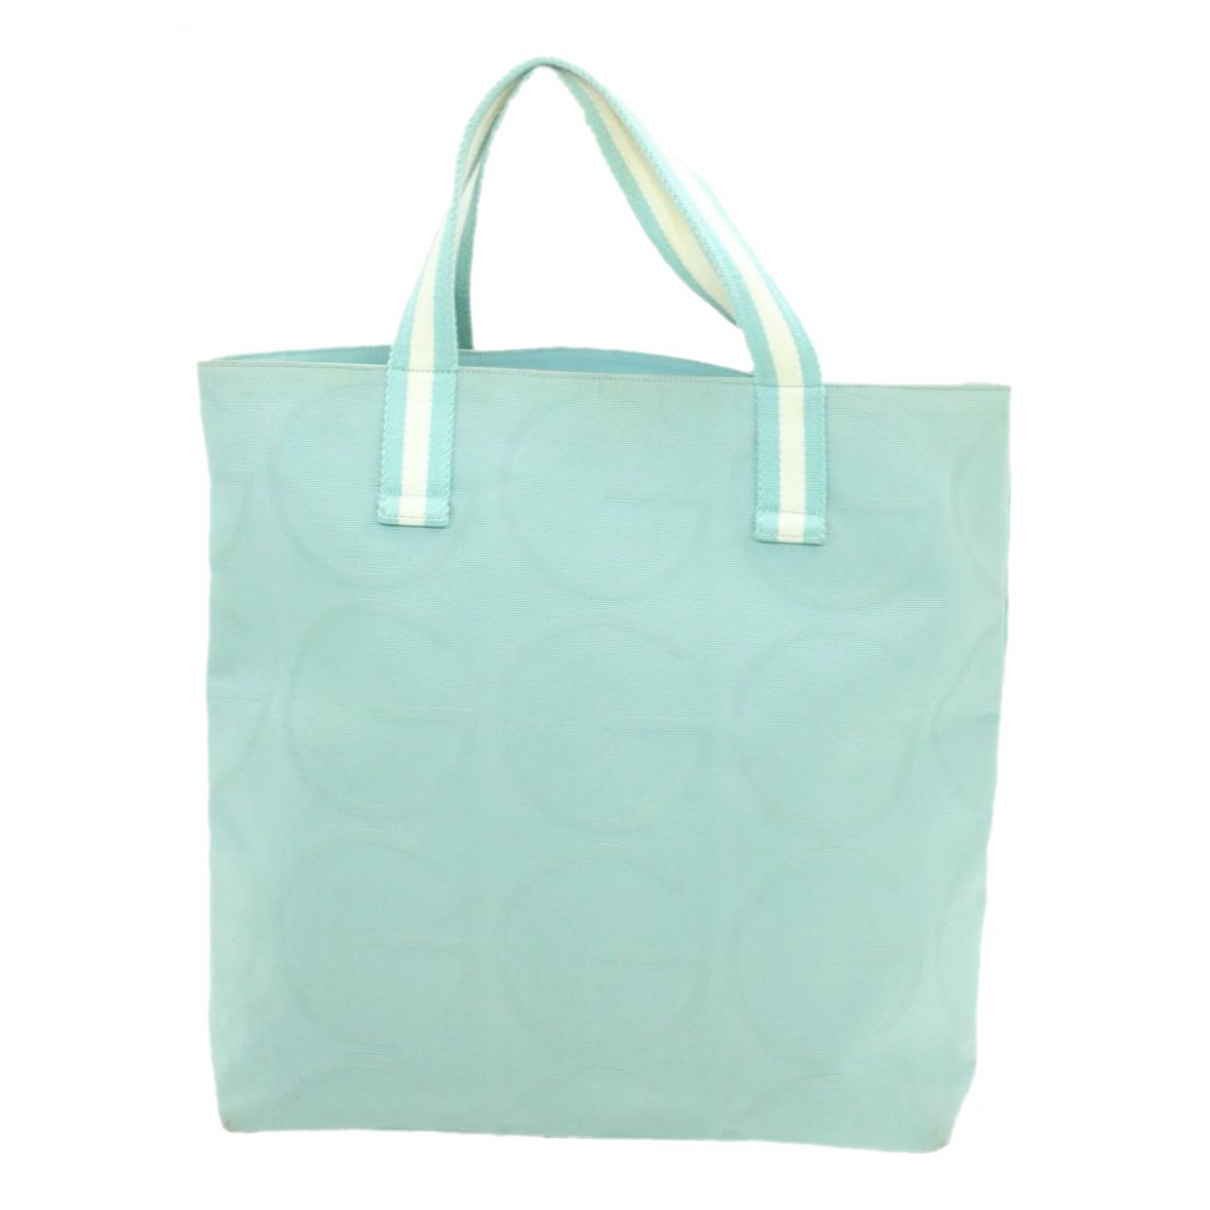 Gucci N Turquoise Cloth handbag for Women N